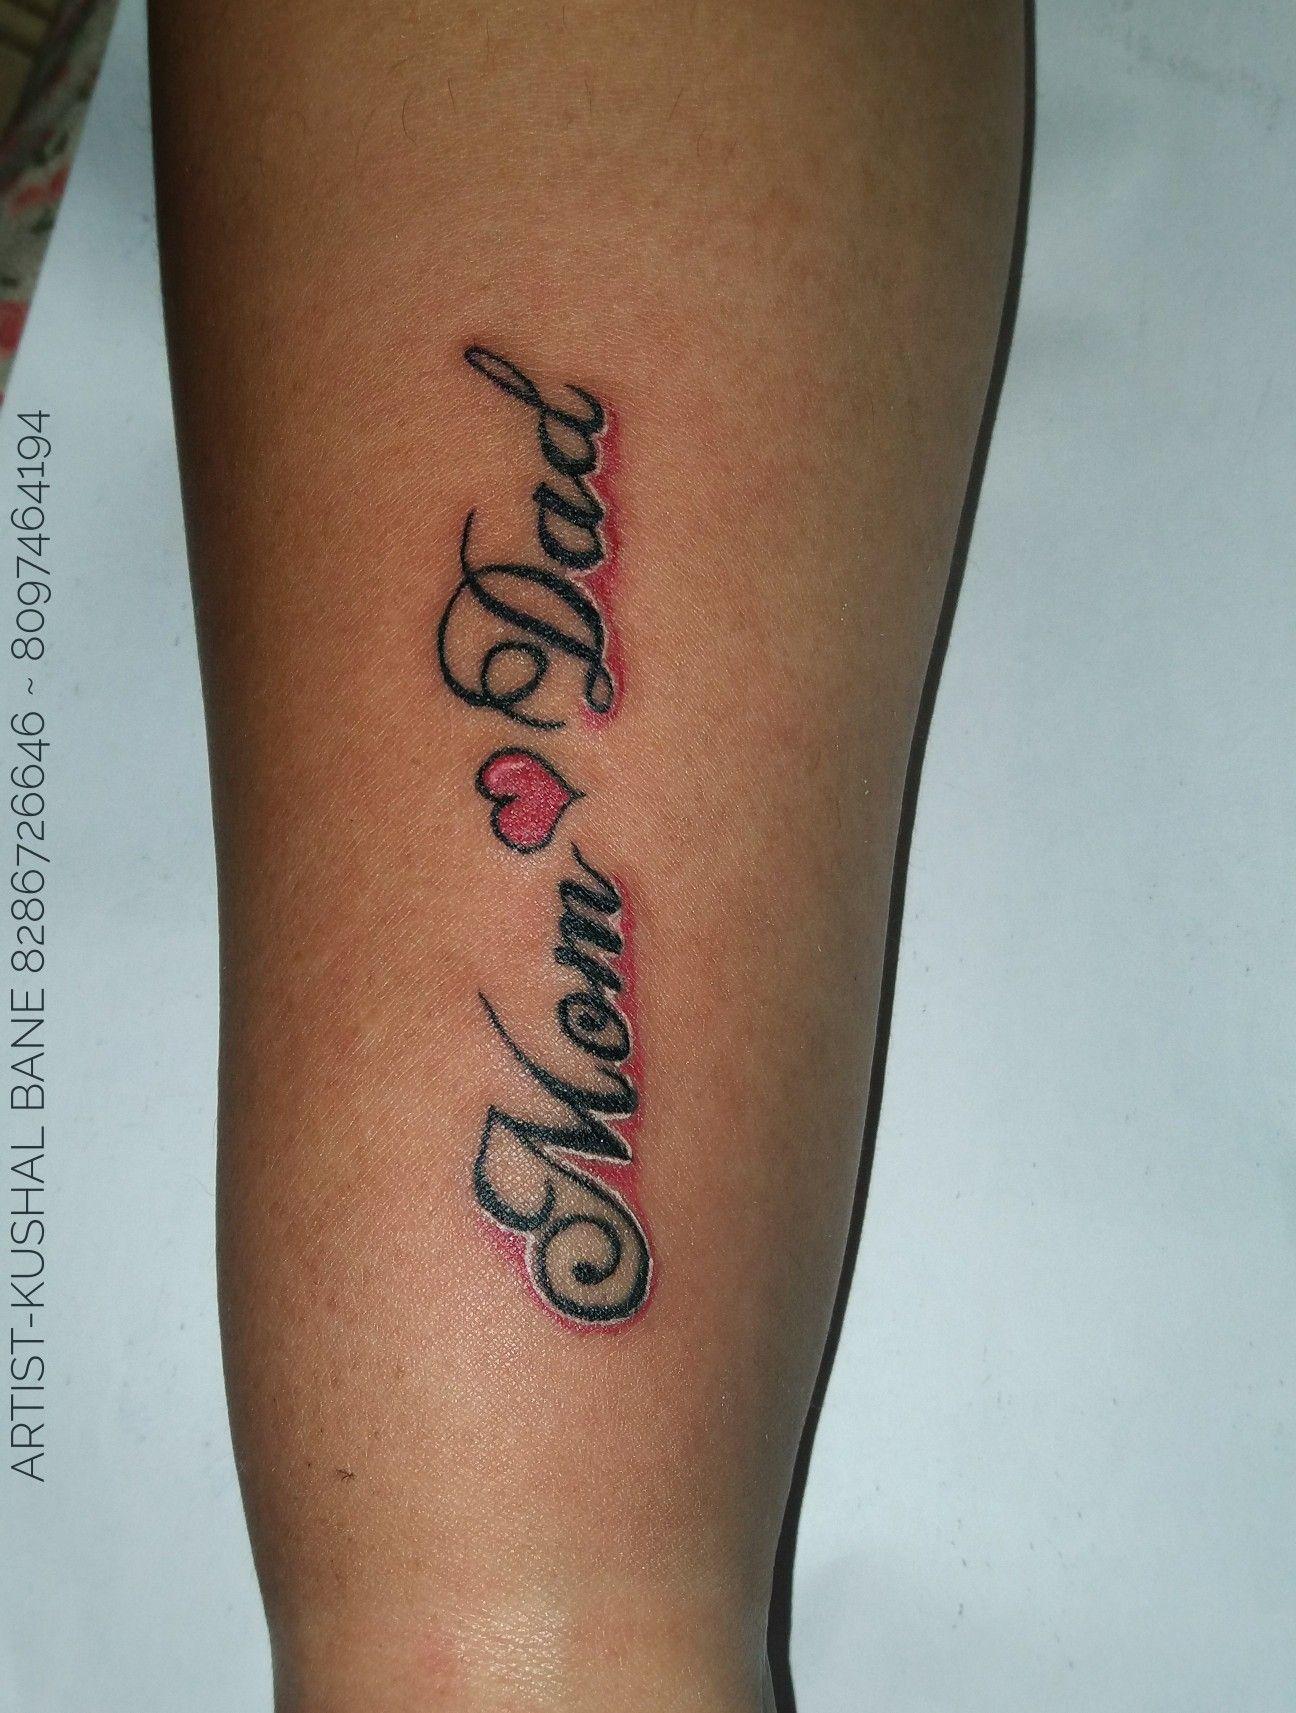 Mom Dad tattoo Dad tattoos, Mom dad tattoos, Tattoos